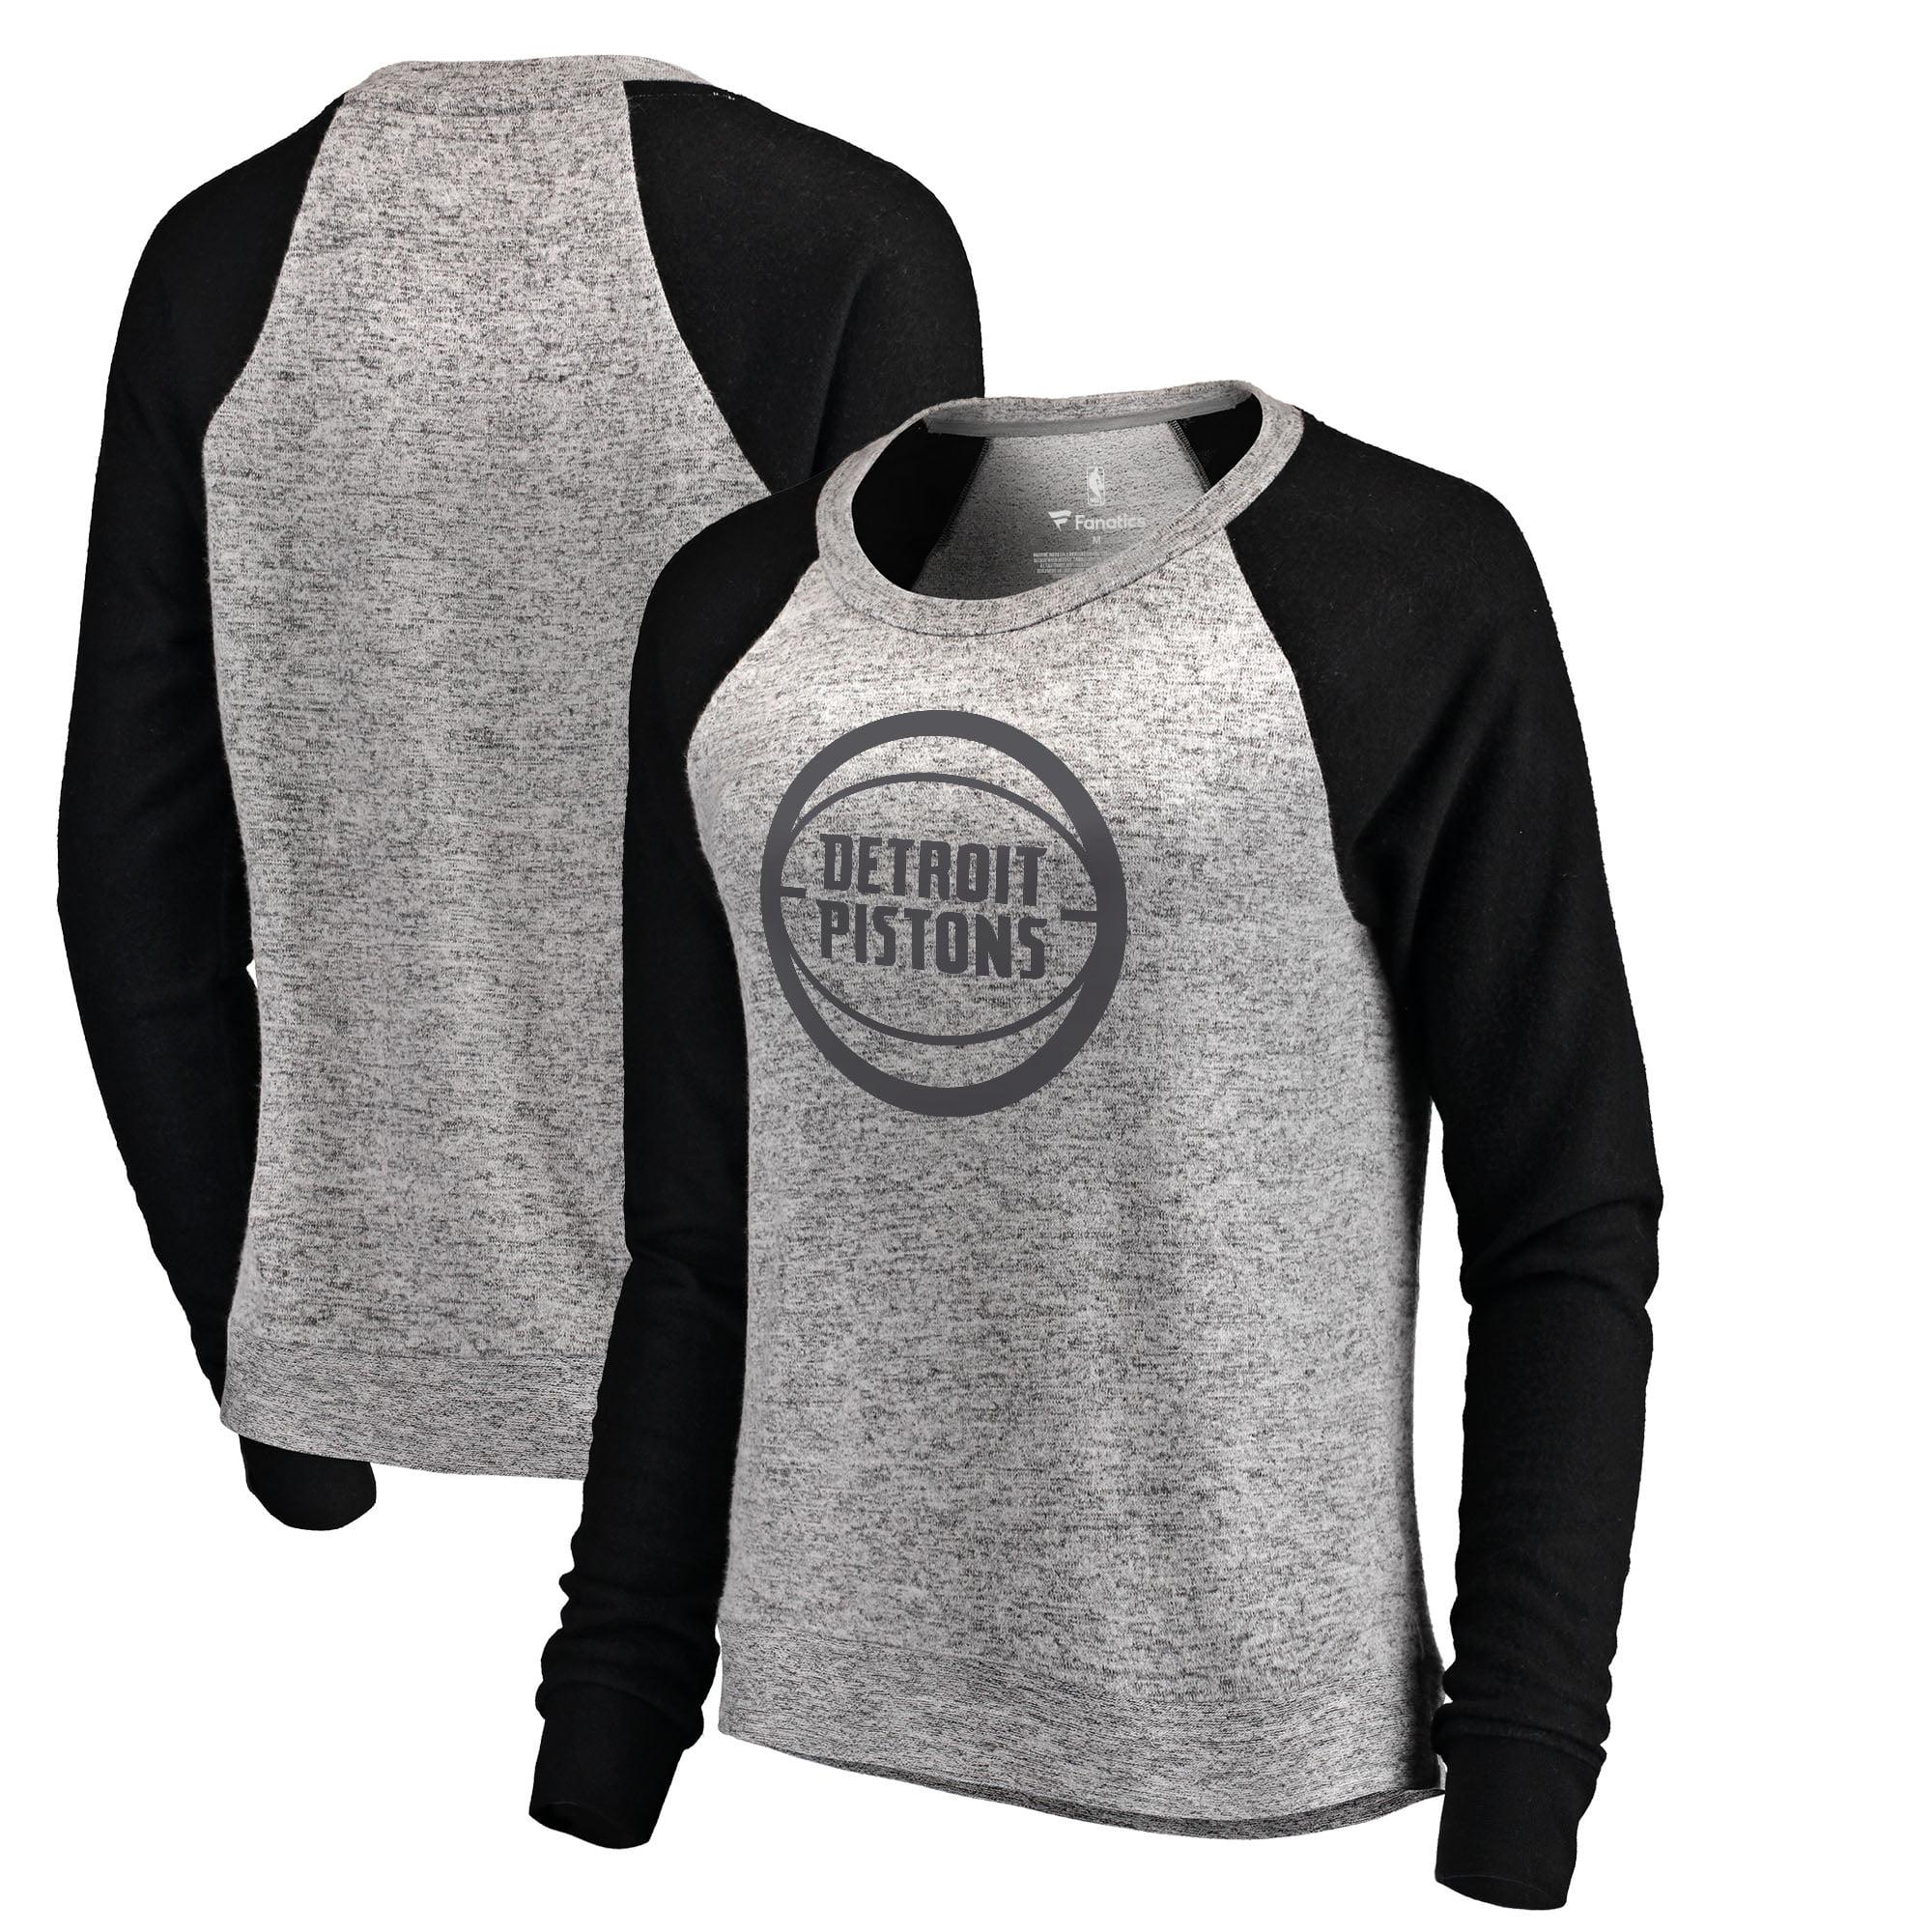 Detroit Pistons Let Loose by RNL Women's Cozy Collection Plush Raglan Crew Neck Sweatshirt - Ash/Black